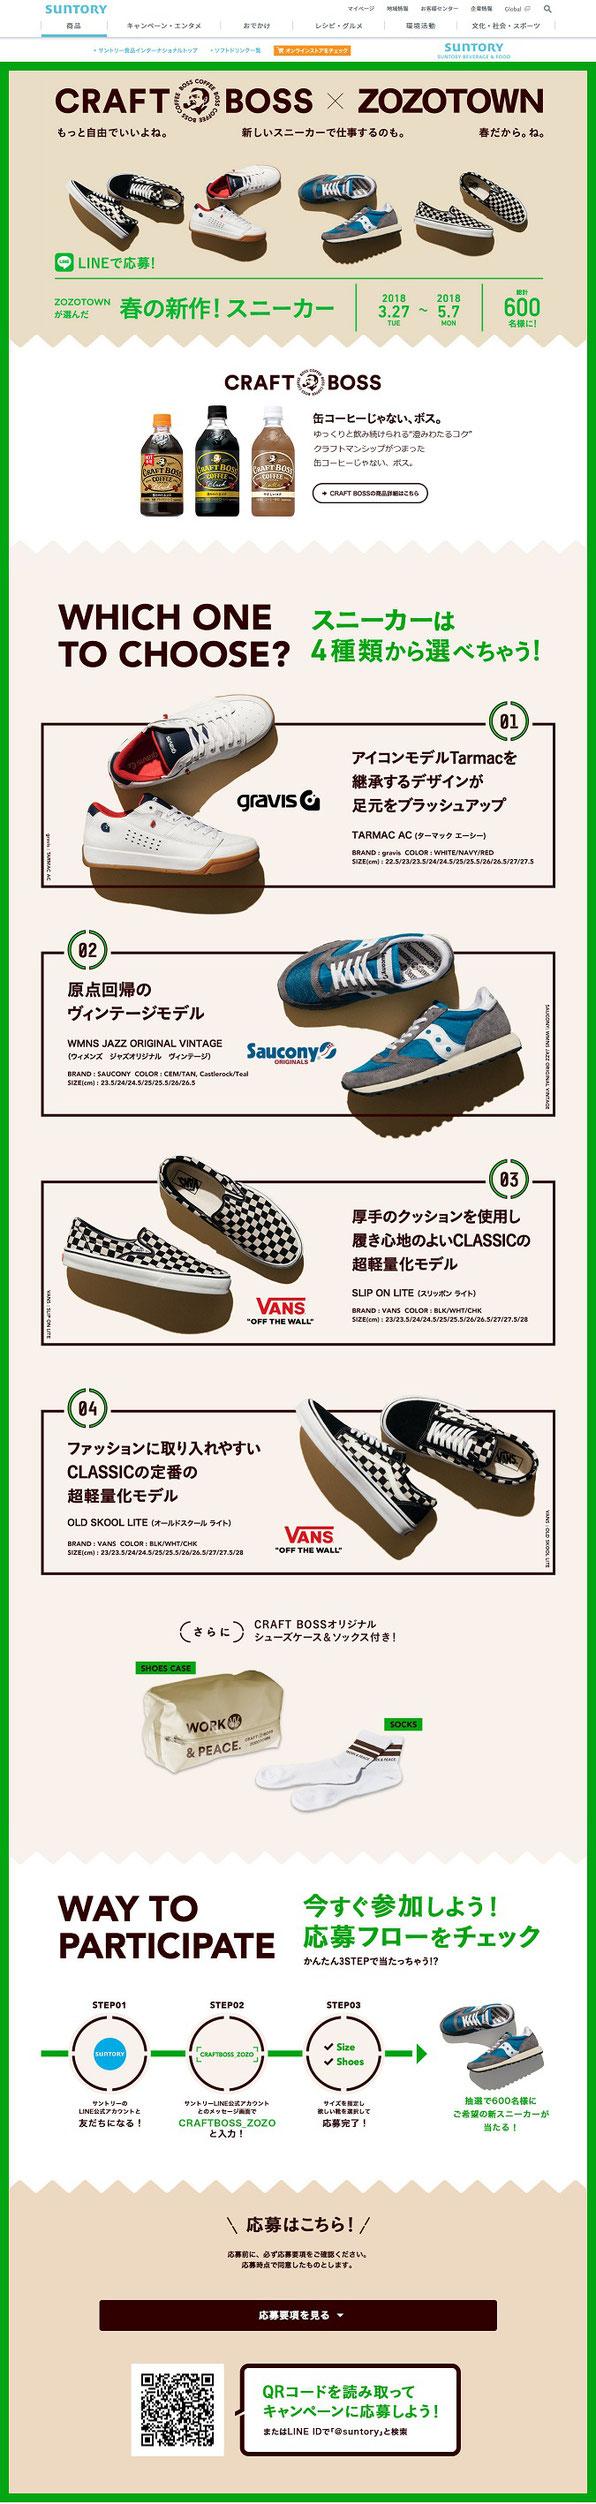 【BOSS】CRAFT BOSS×ZOZO TOWN 春の新作スニーカープレゼントキャンペーン